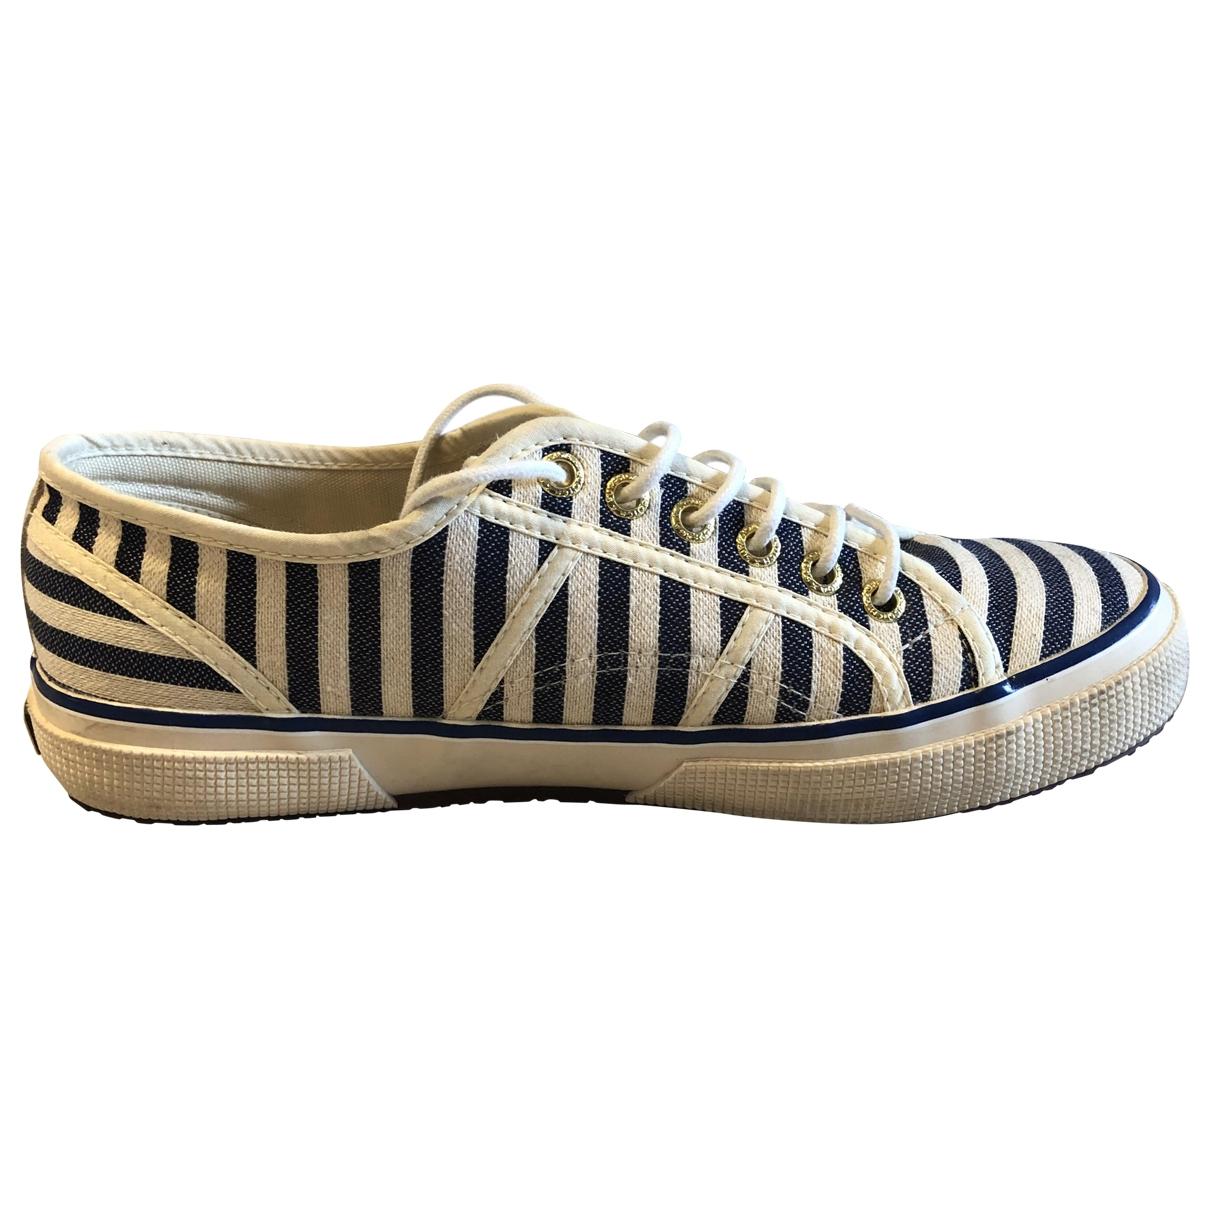 Superga \N Sneakers in  Weiss Leinen